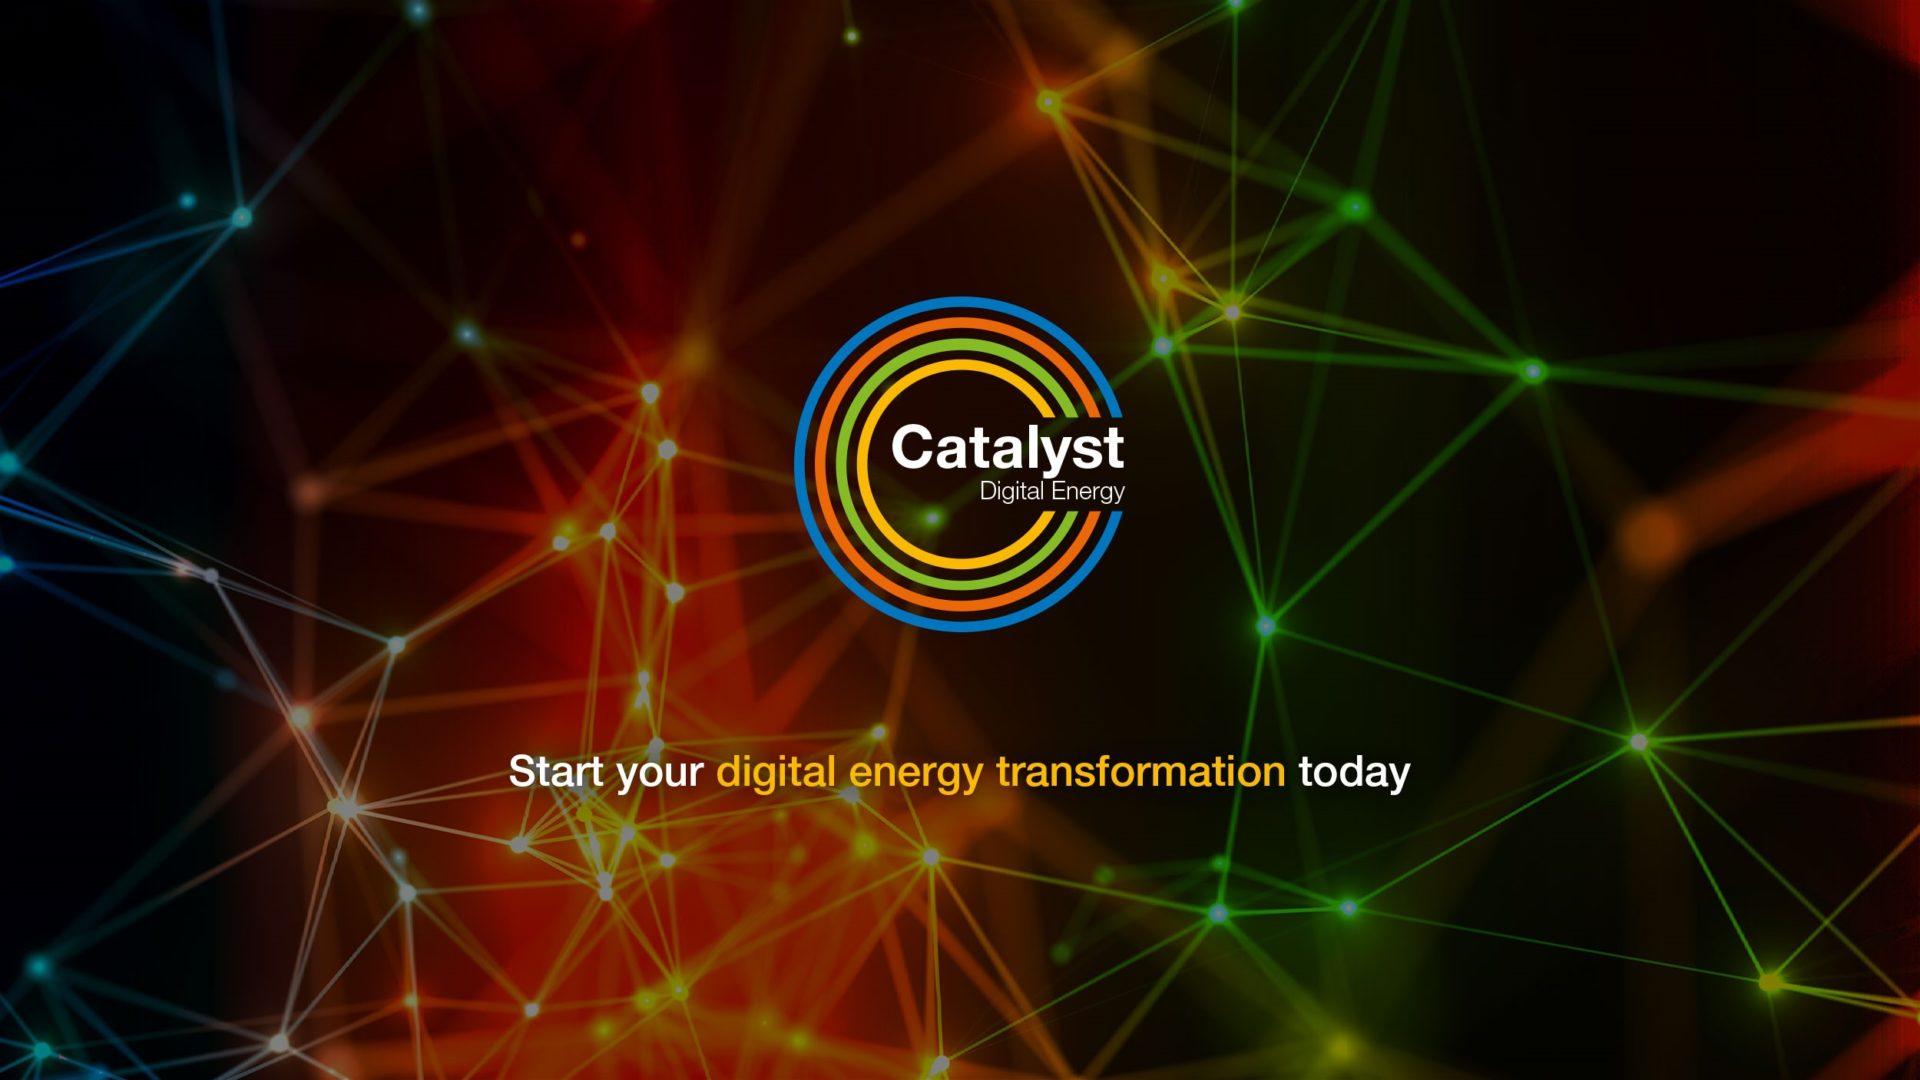 Business Energy News